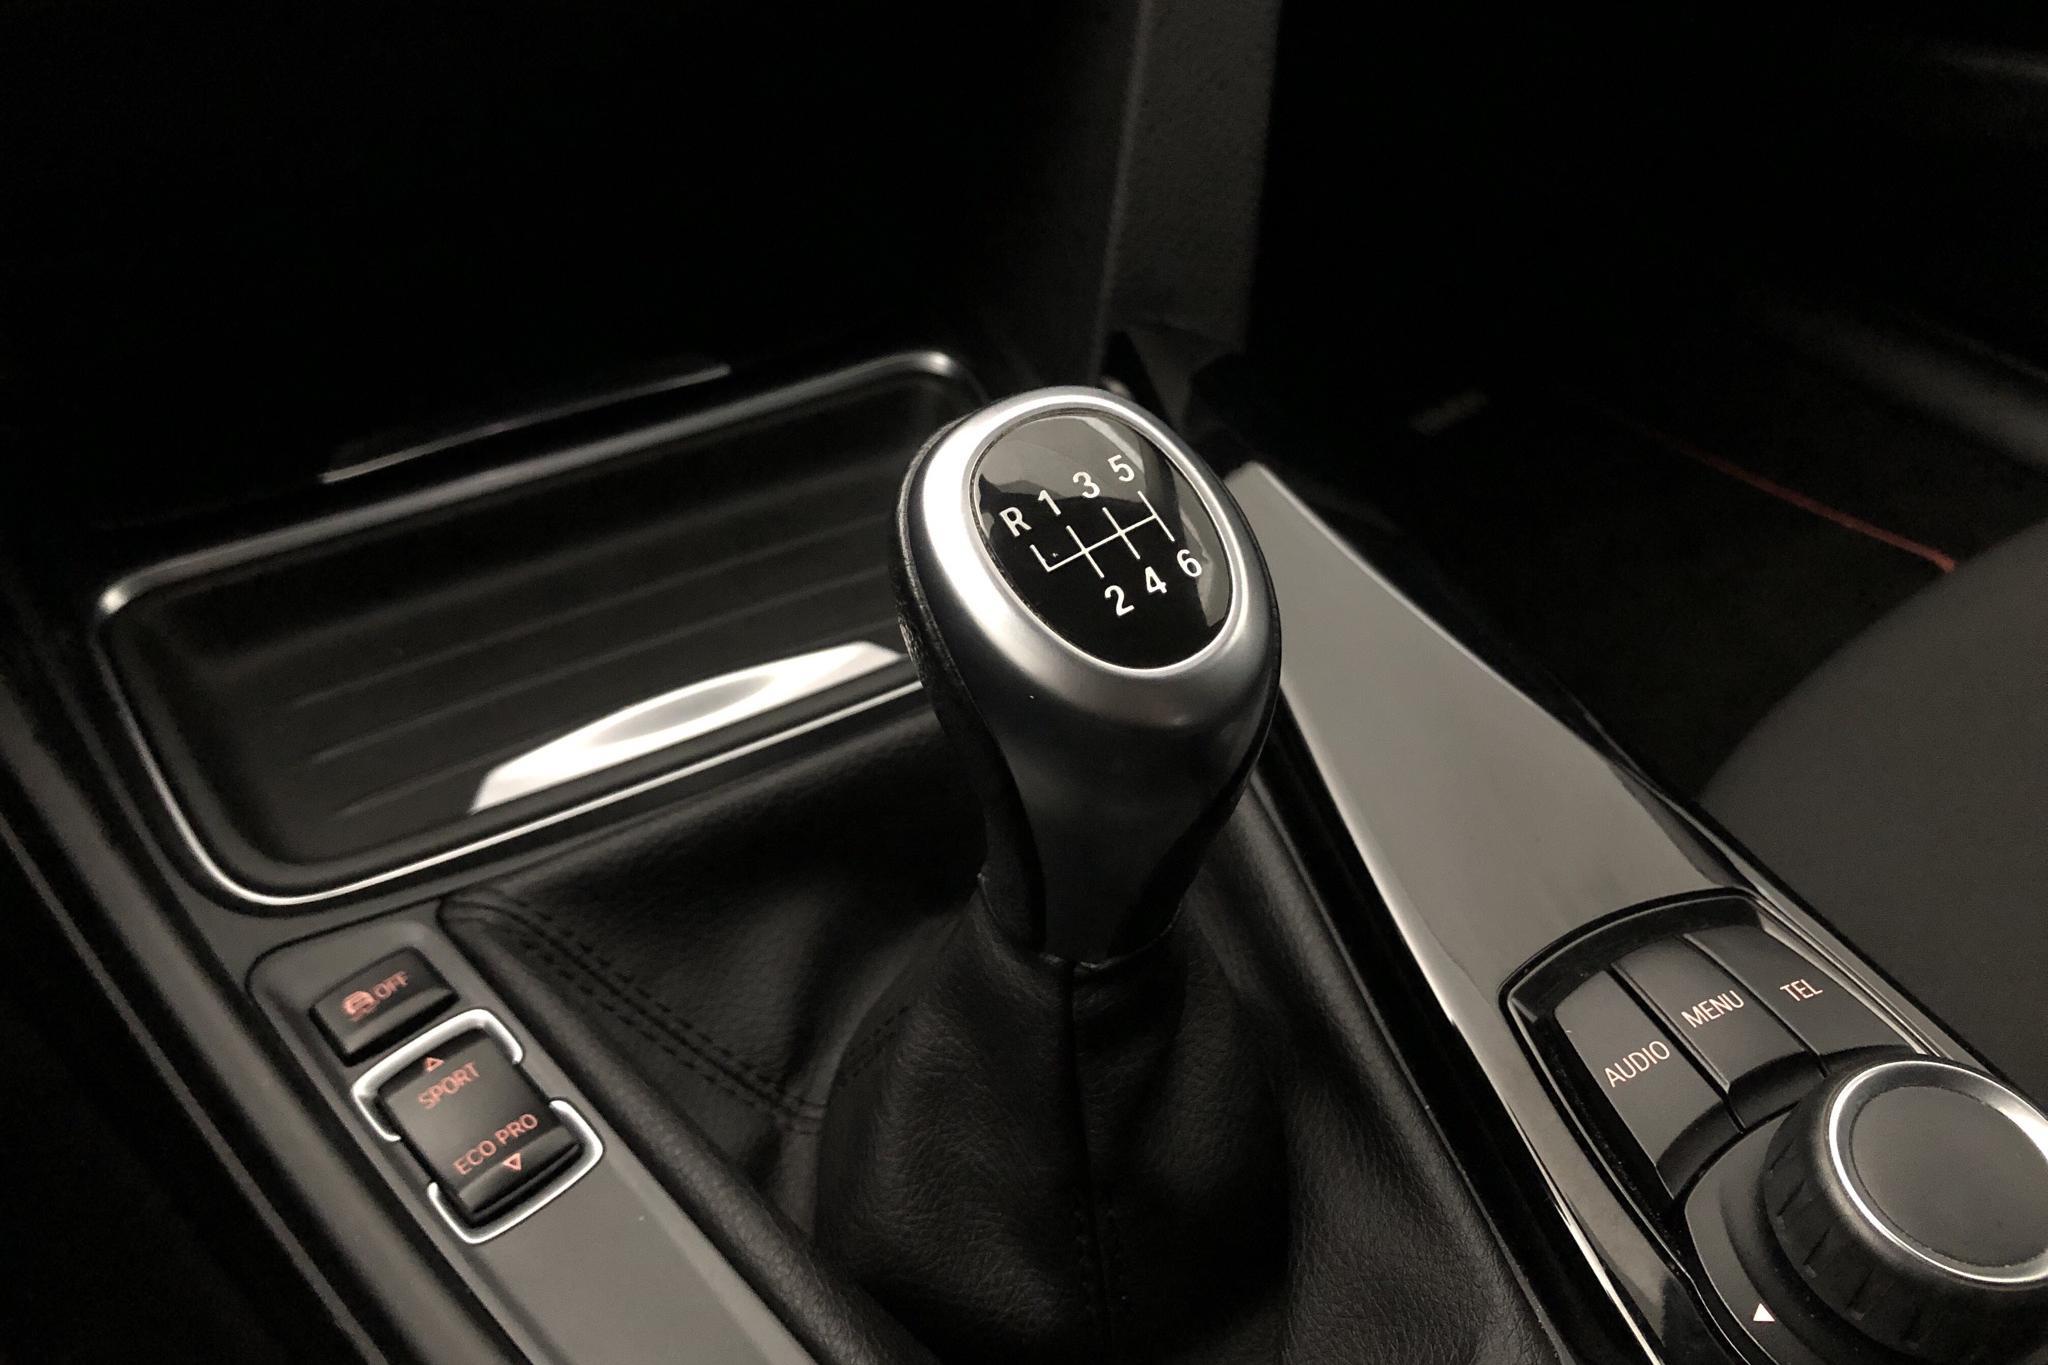 BMW 320d Sedan, F30 (184hk) - 110 410 km - Manual - silver - 2012